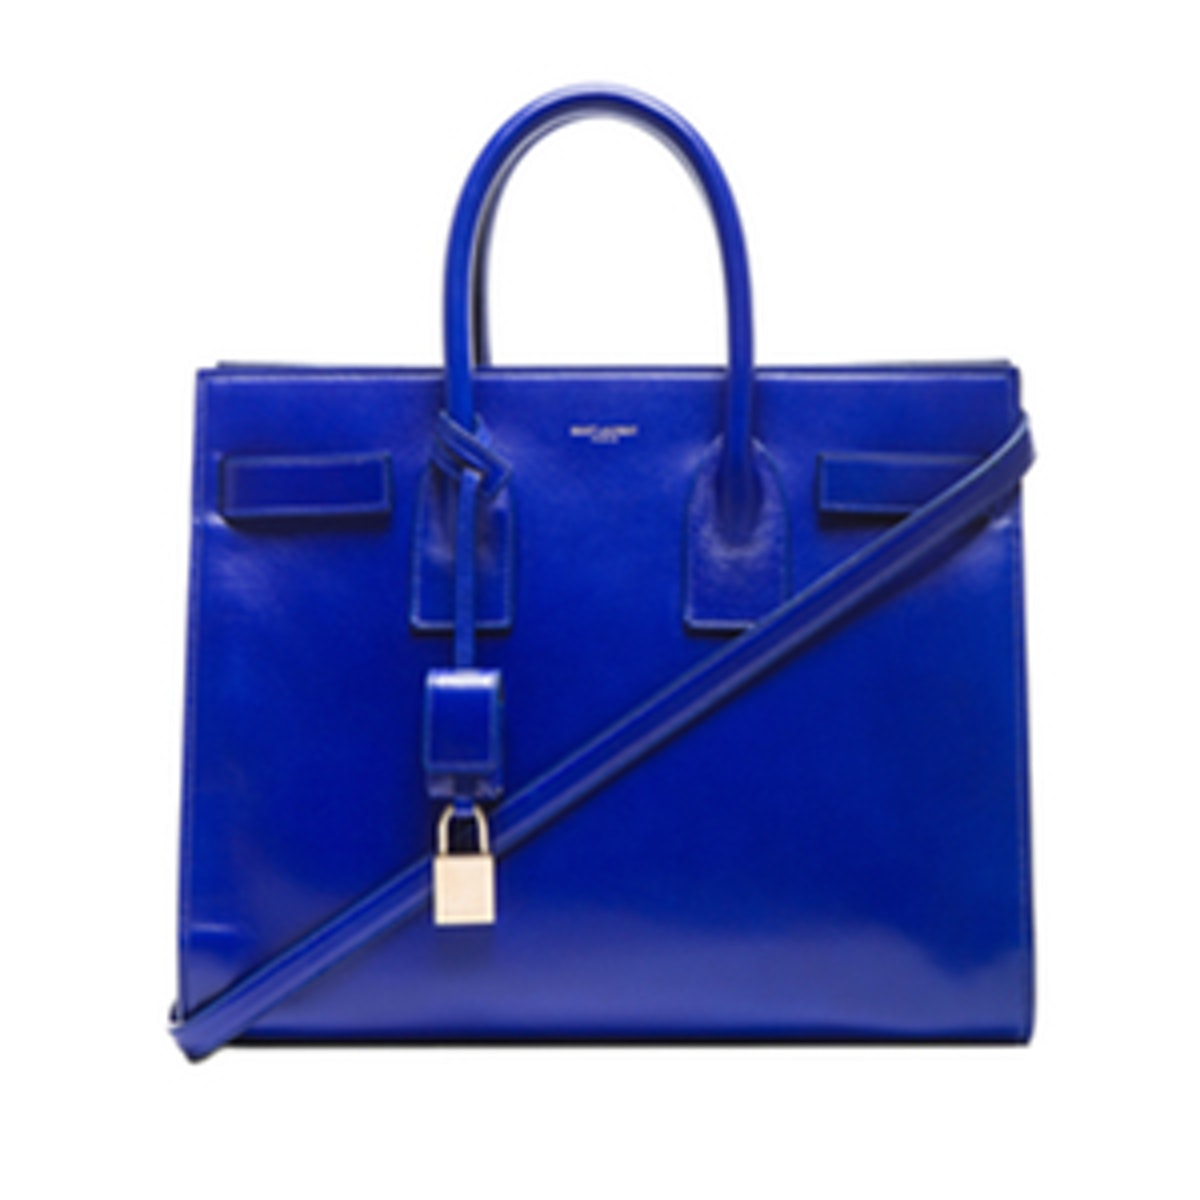 Small Sac De Jour Bag in Neon Blue